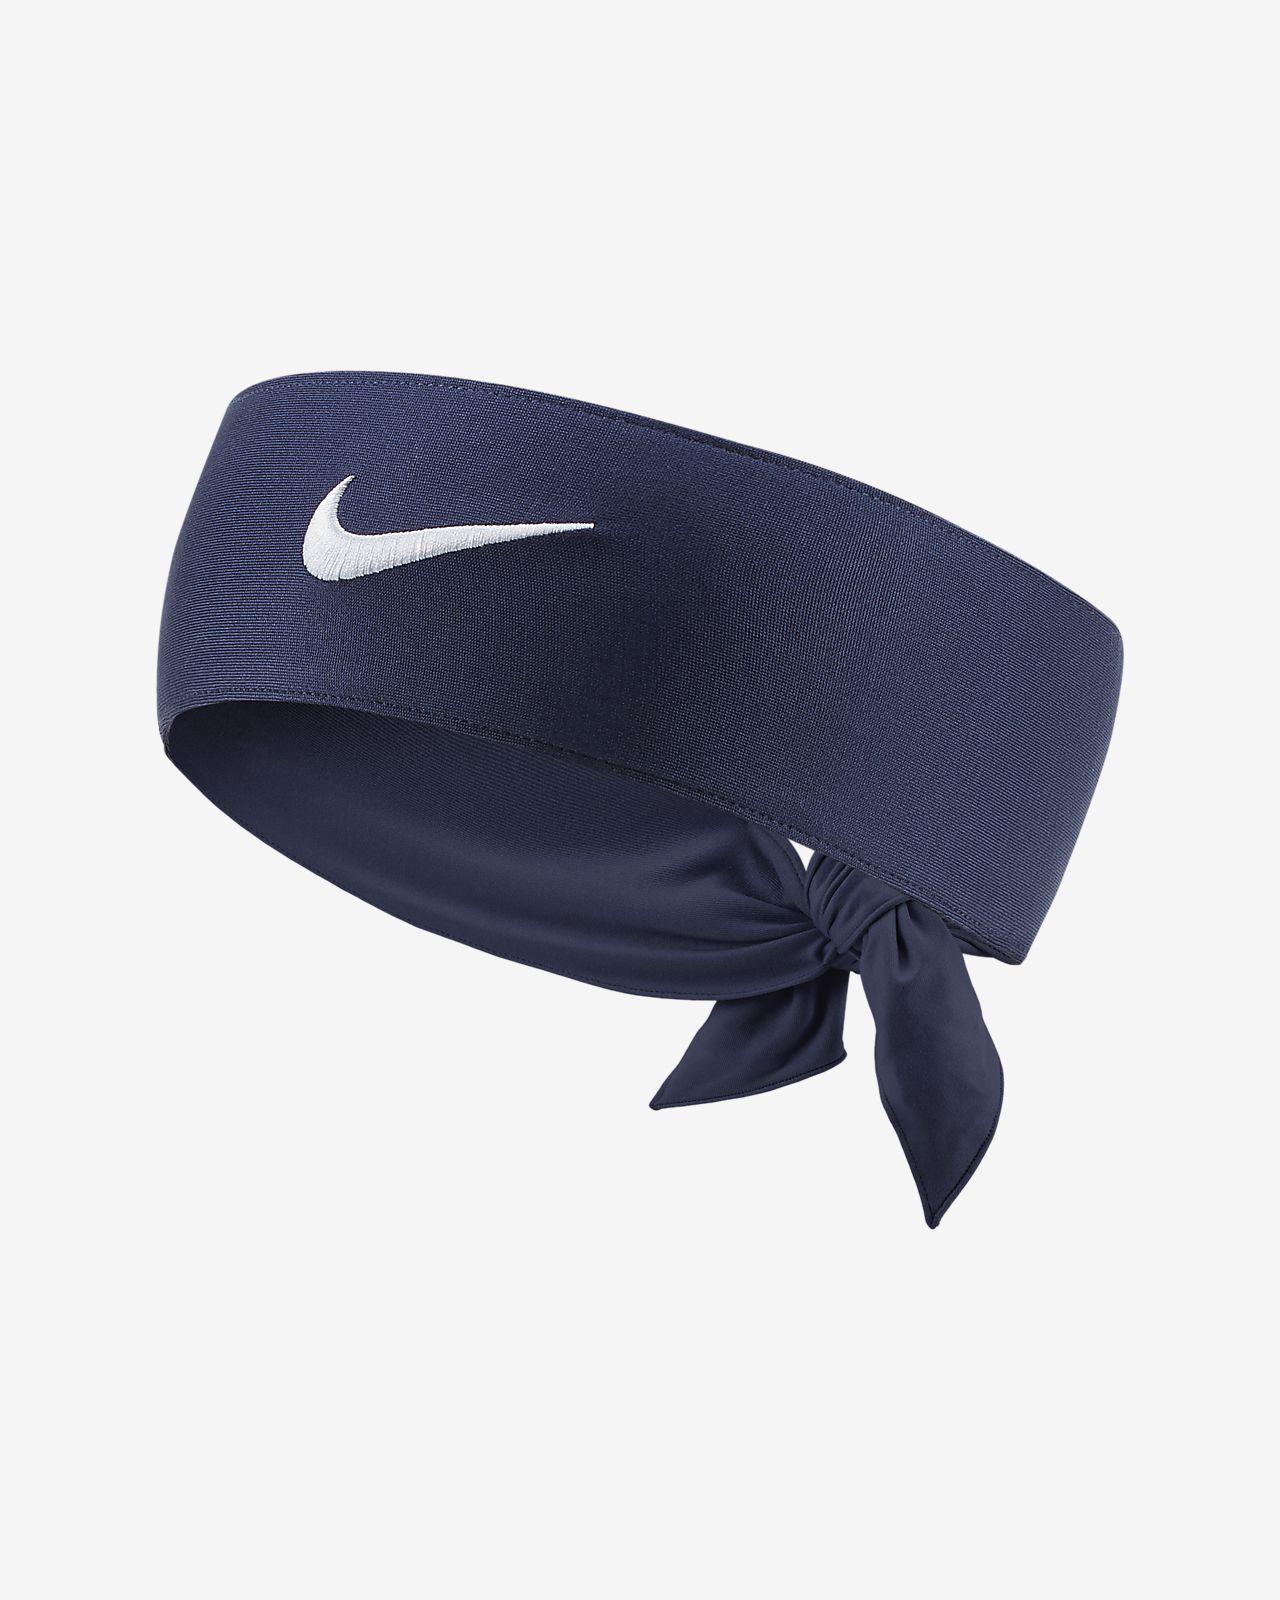 NikeCourt Dri-FIT 2.0 Tennis Head Tie. Nike.com LU 063b97b037c